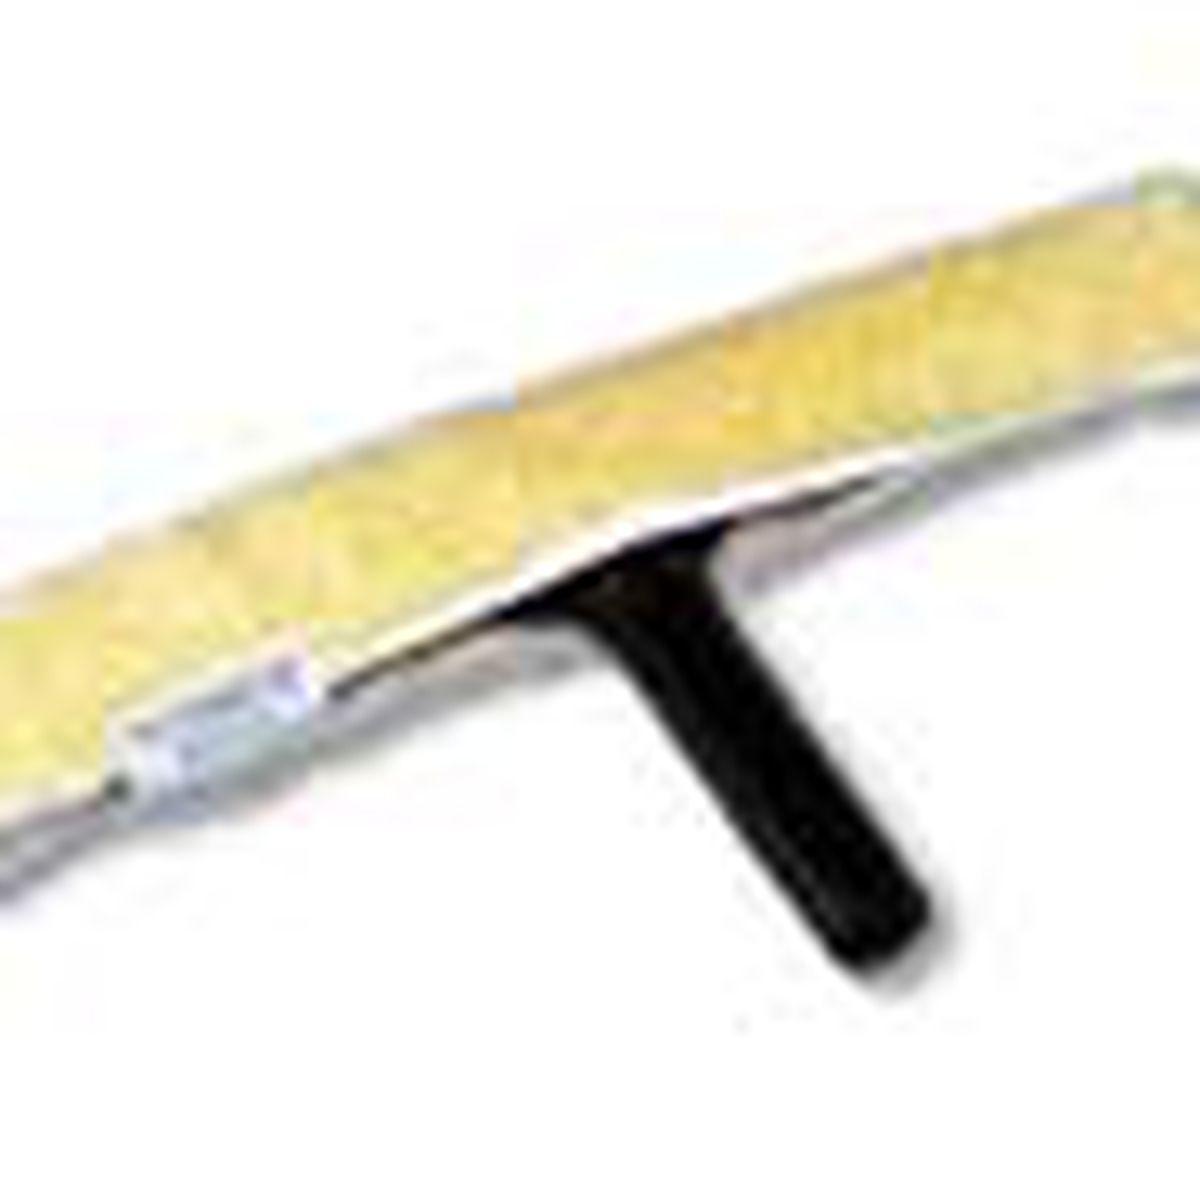 Strip applicator with cloth head